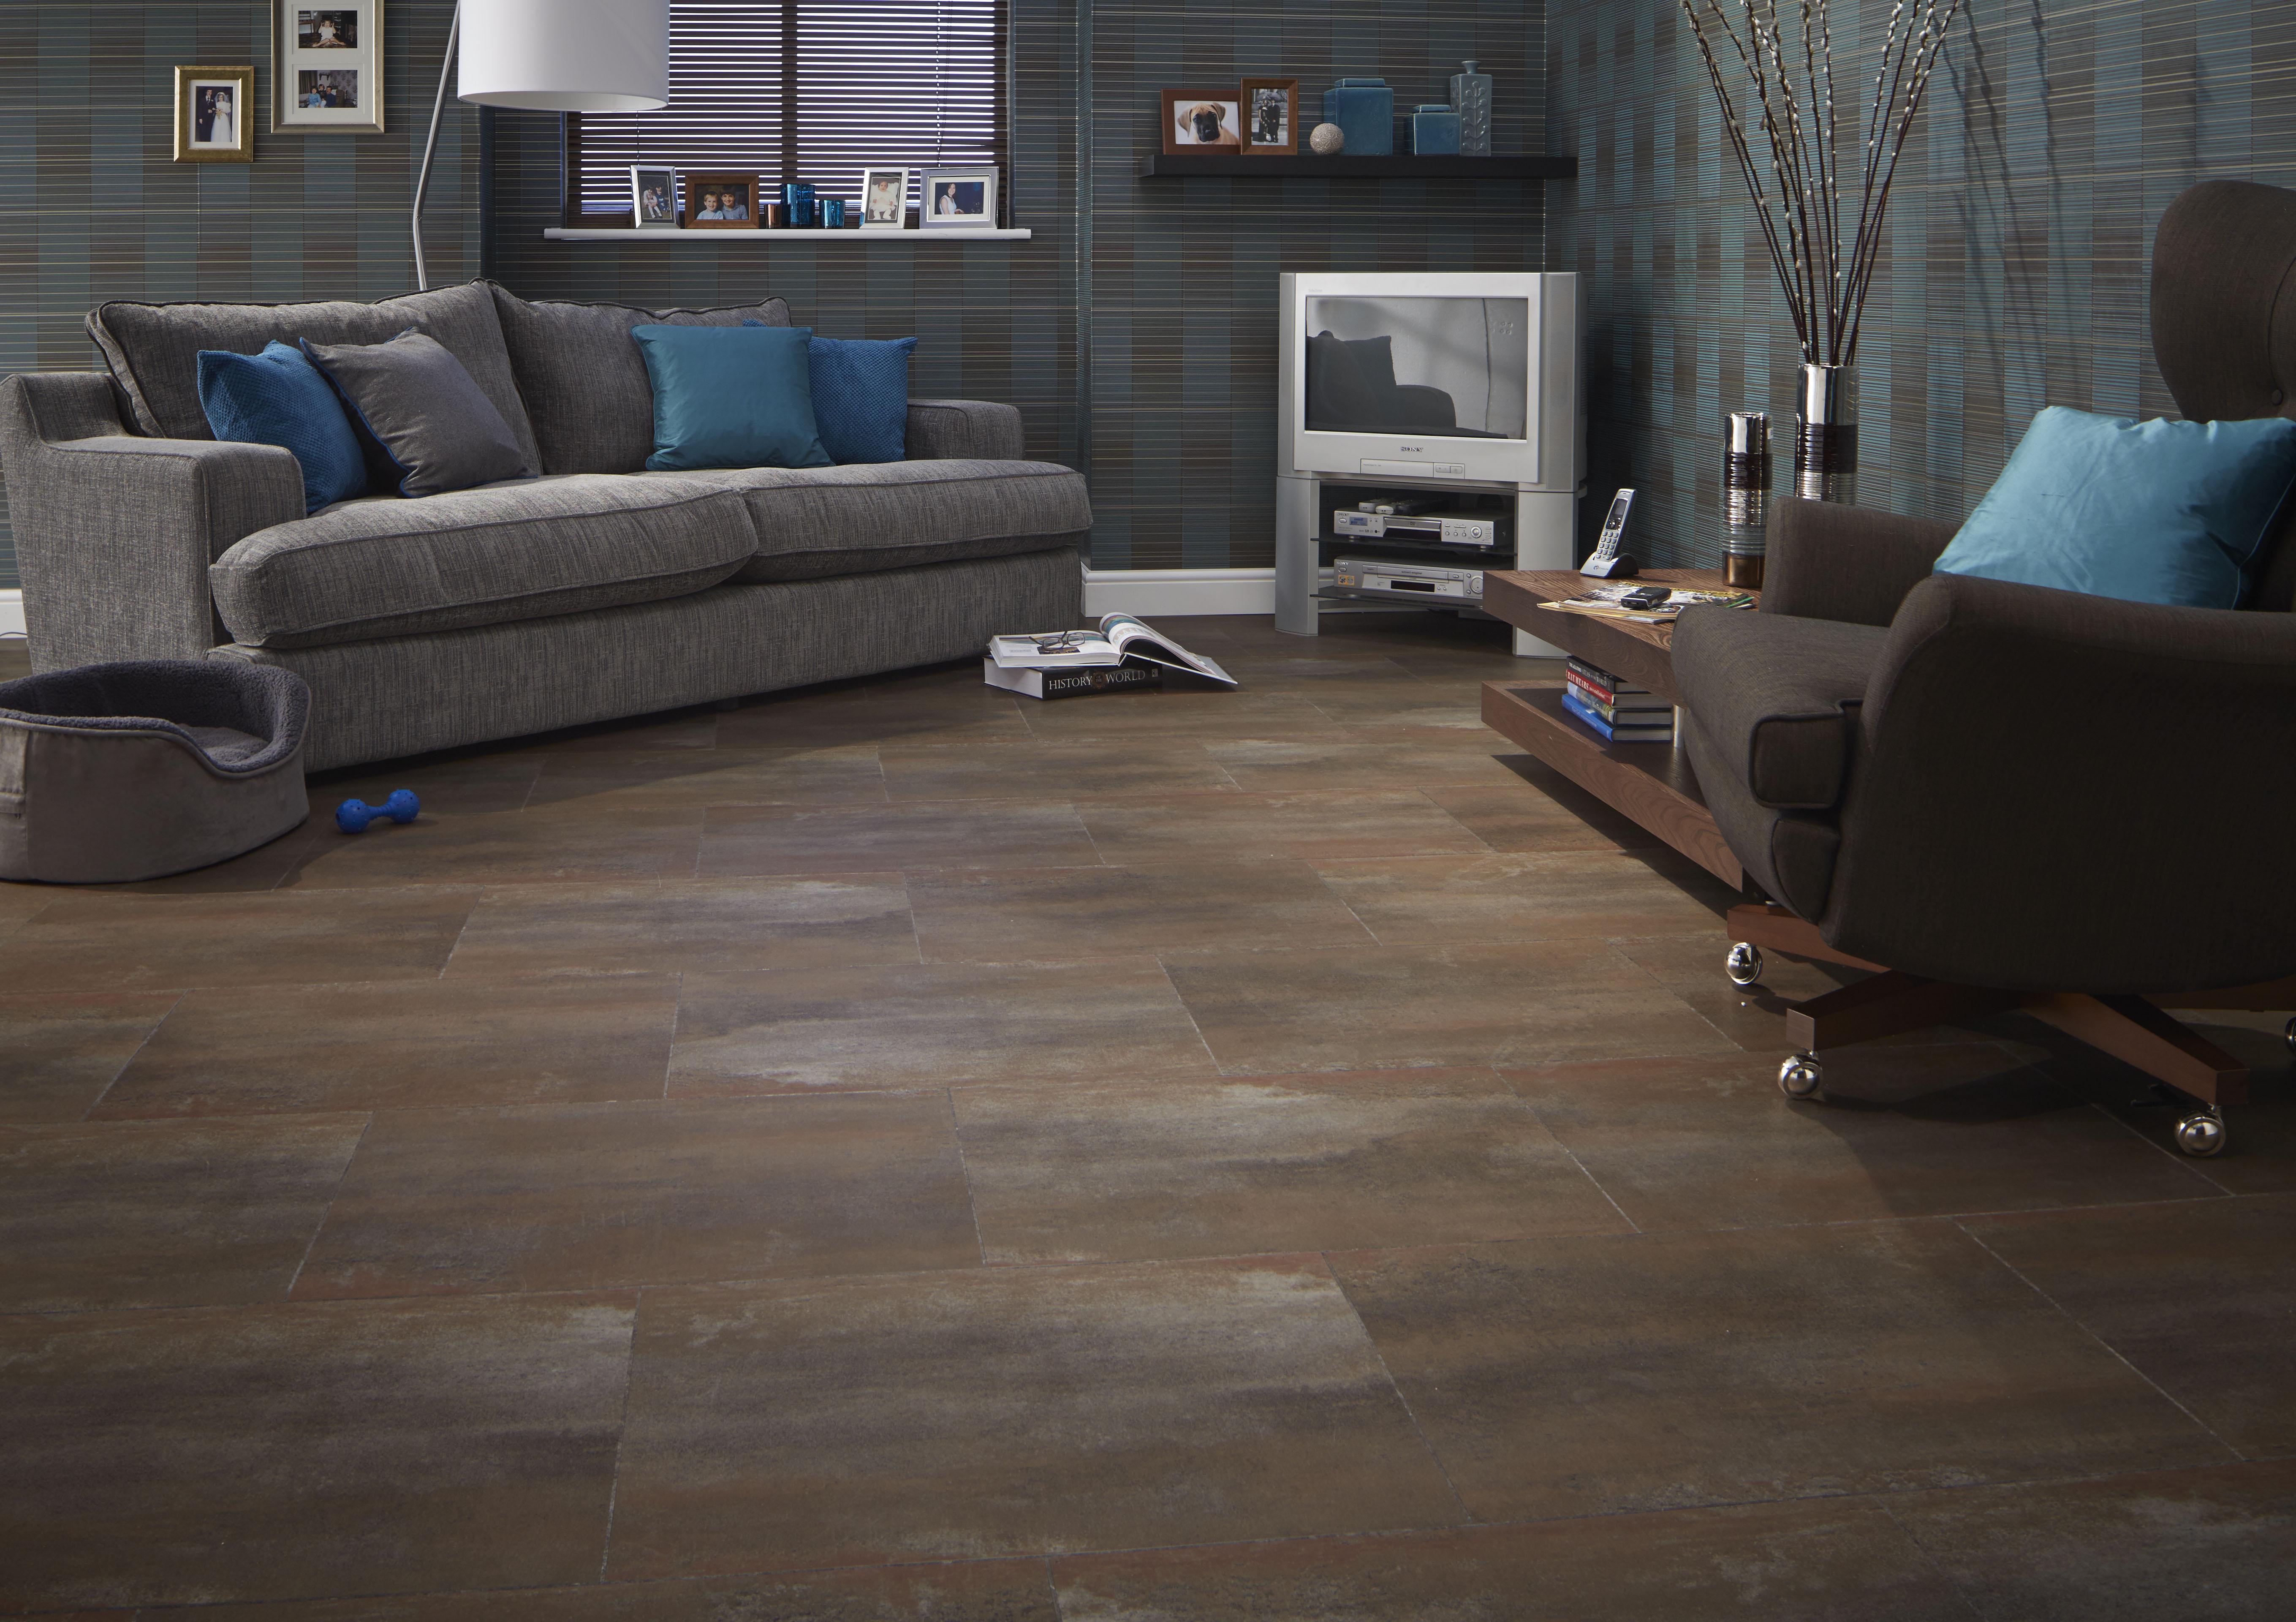 lanarkshire floor this avoca services flooring karndean about cleaning carpet sidebar